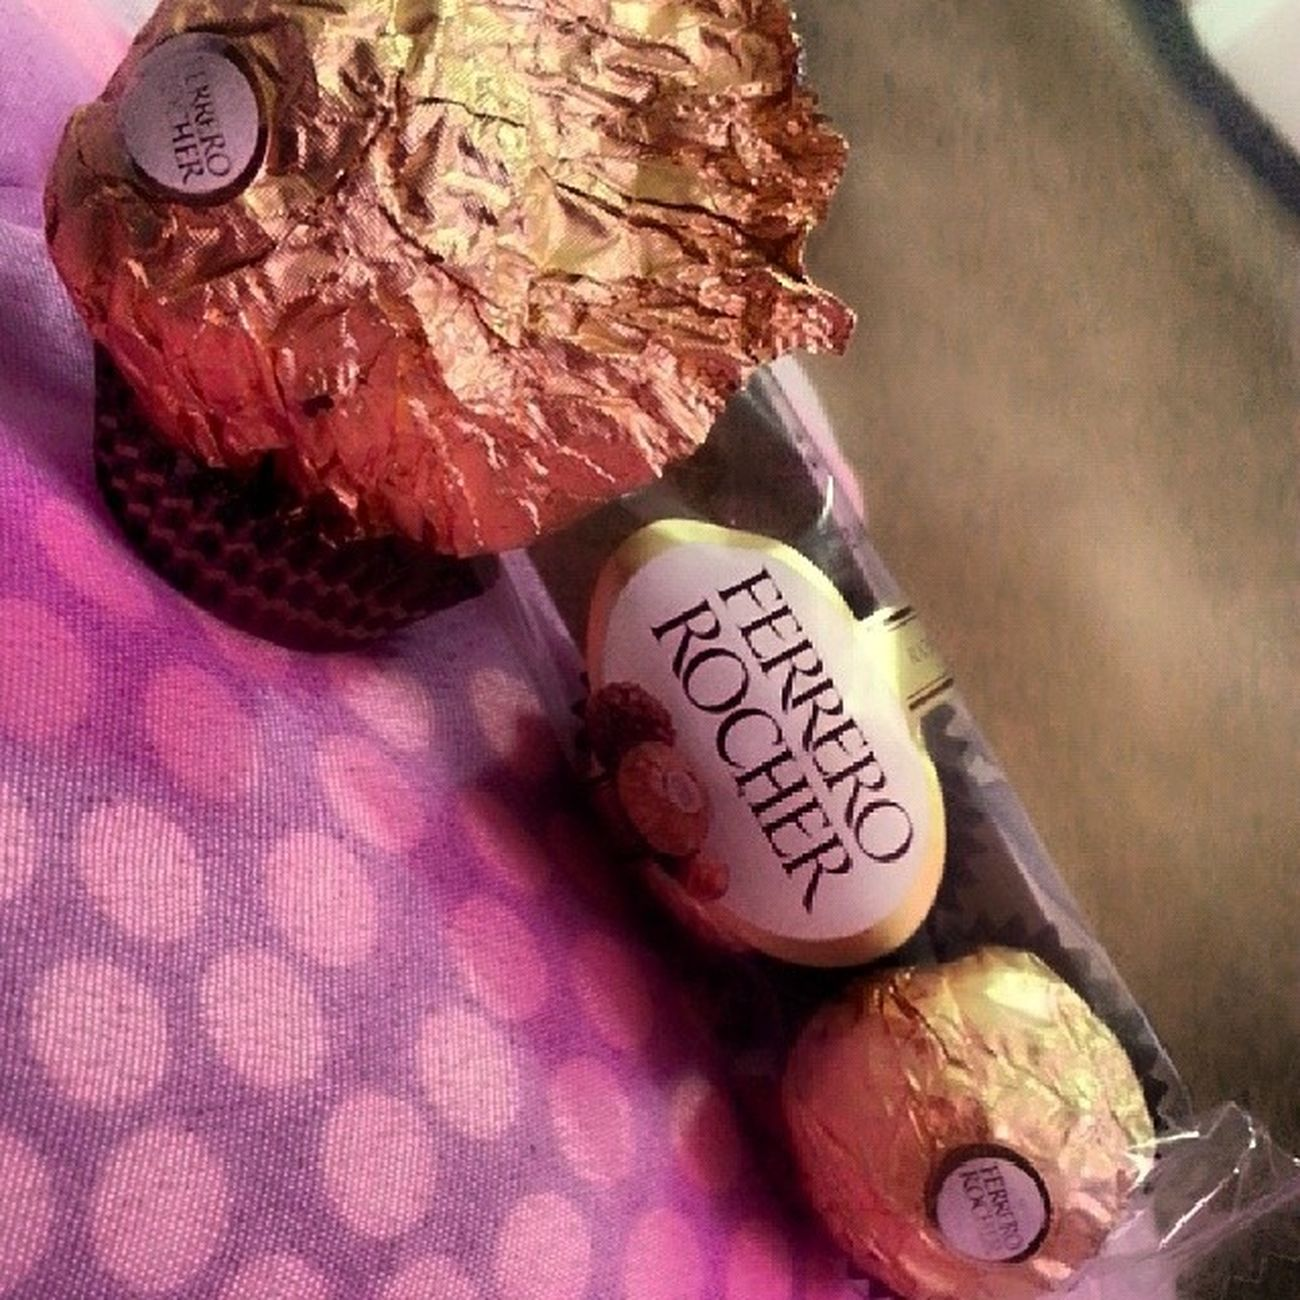 Something is making my heart super happy and my taste buds tickle. Love Chocolates GettingFat Comfortfoods happy ferrero ilovechocolates 100happydays day2